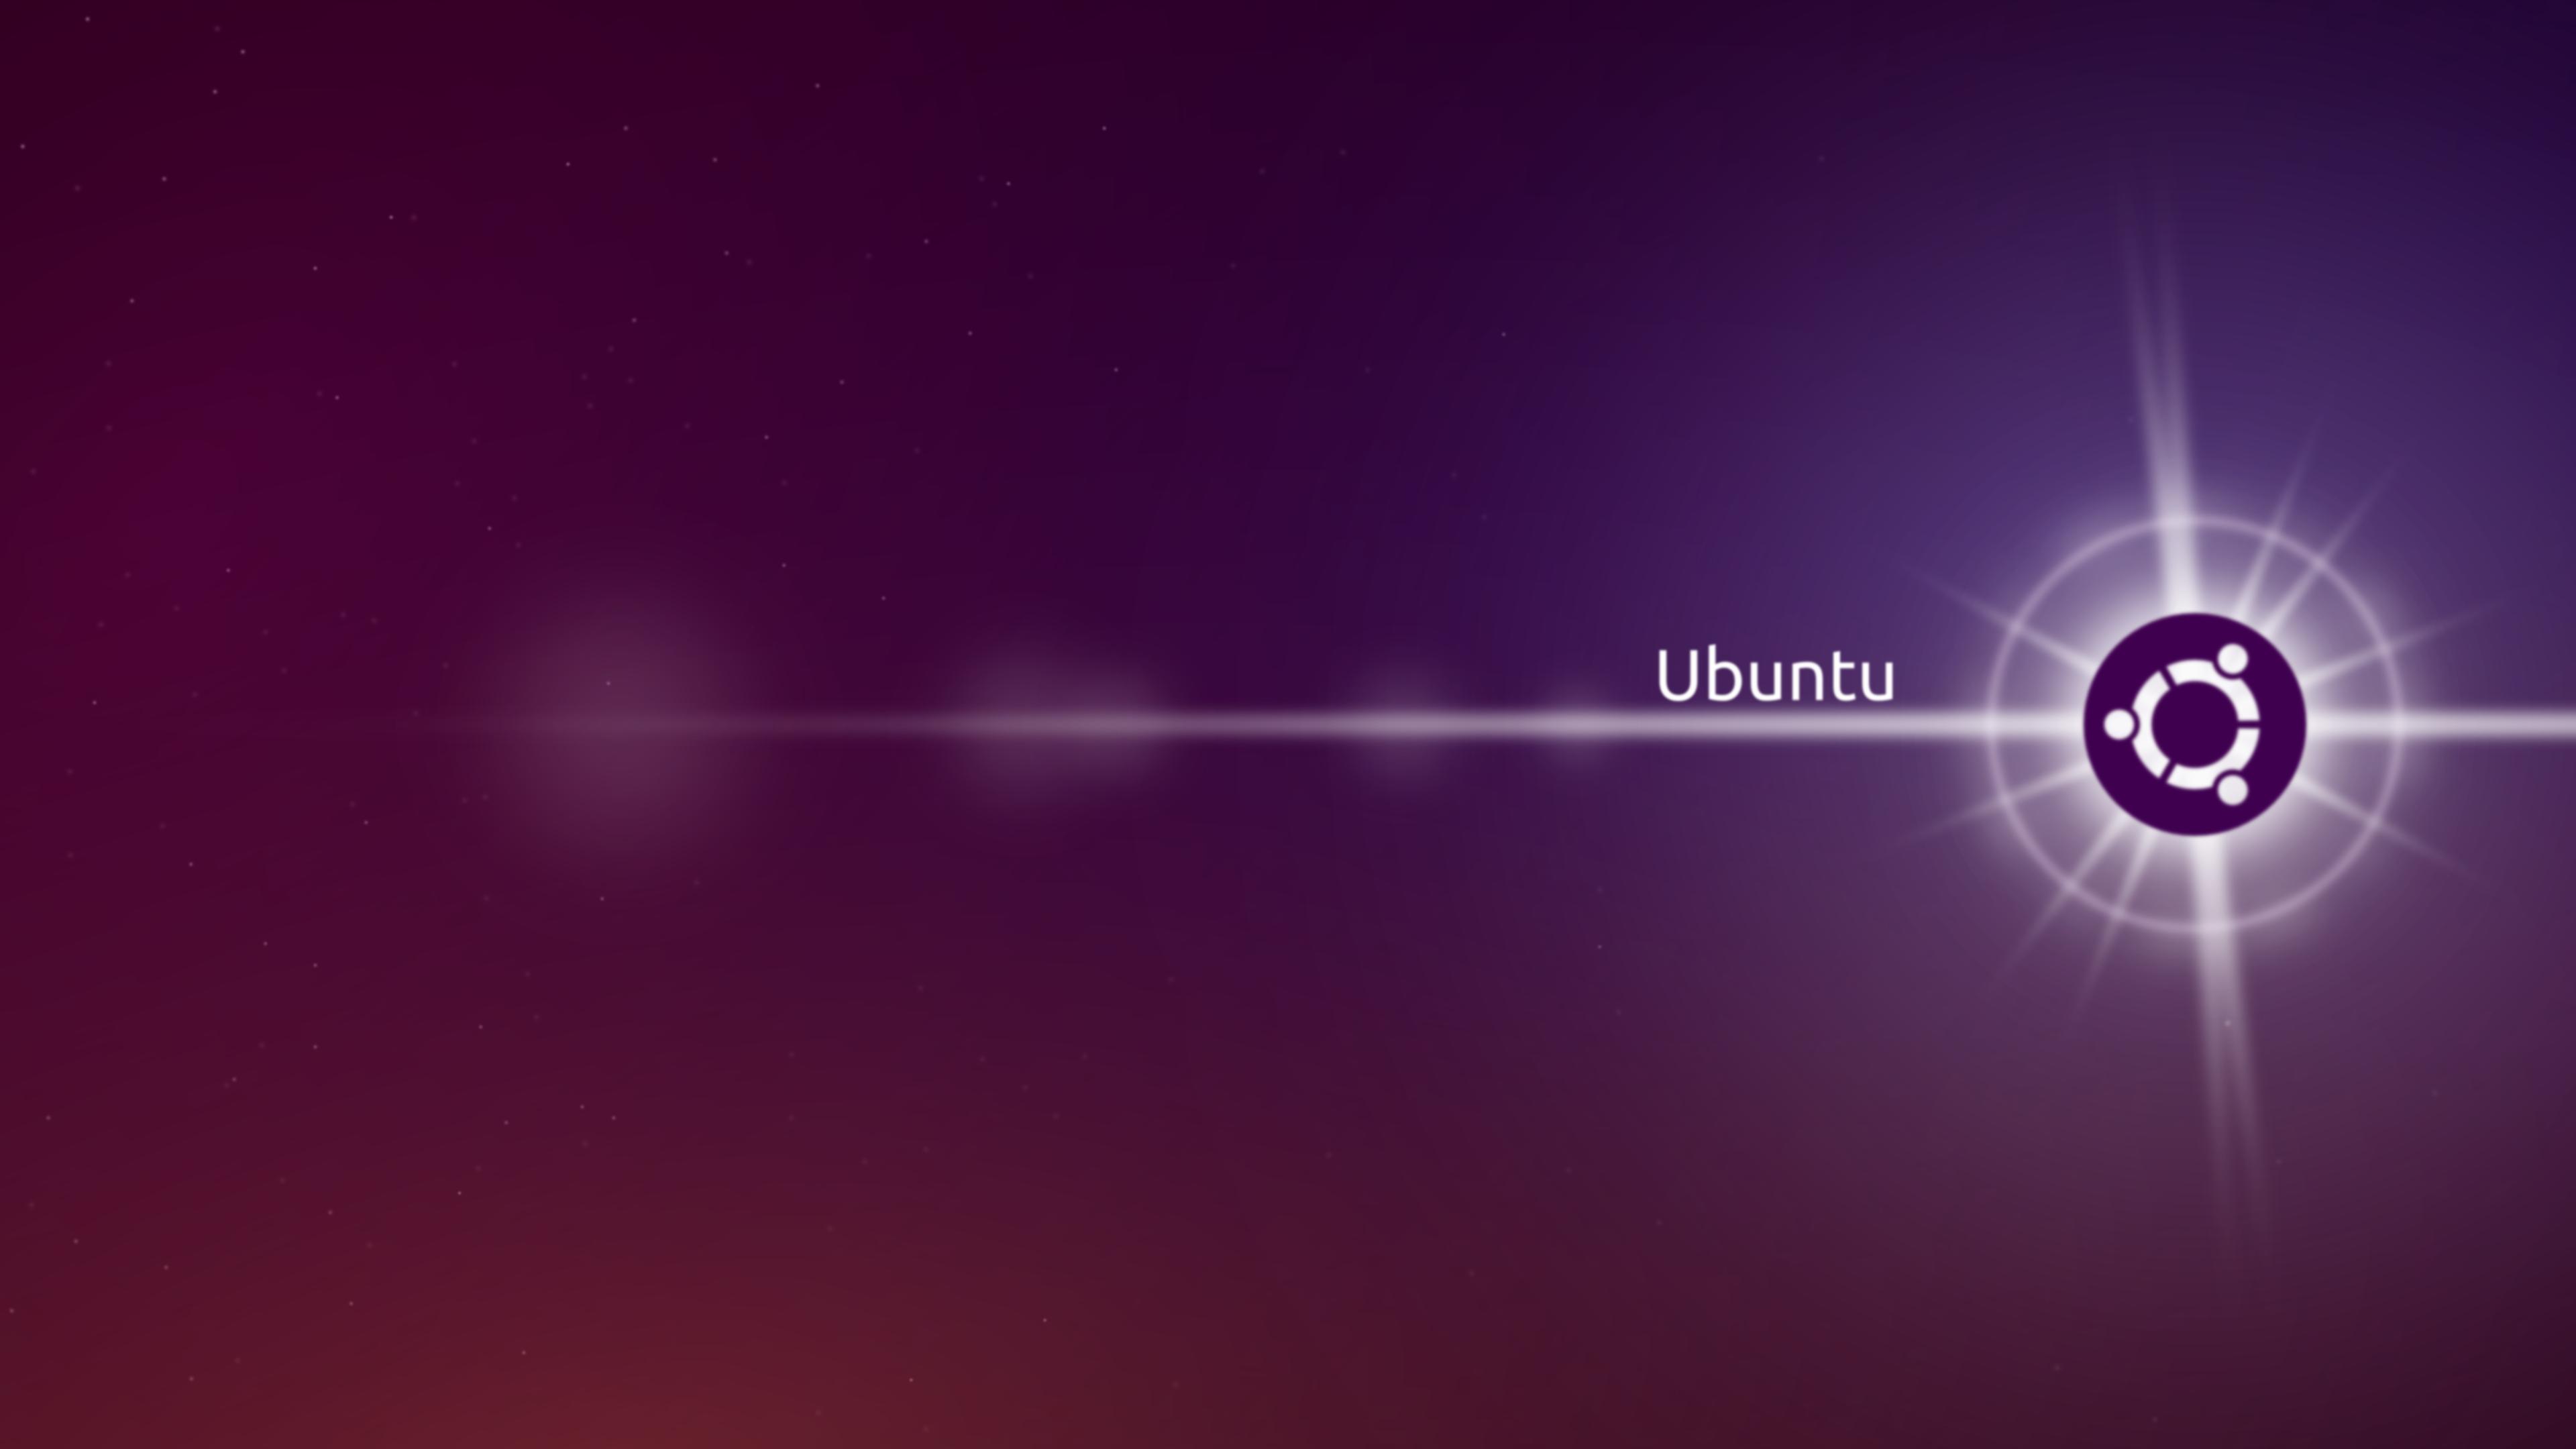 free download ubuntu wallpapers hd ...